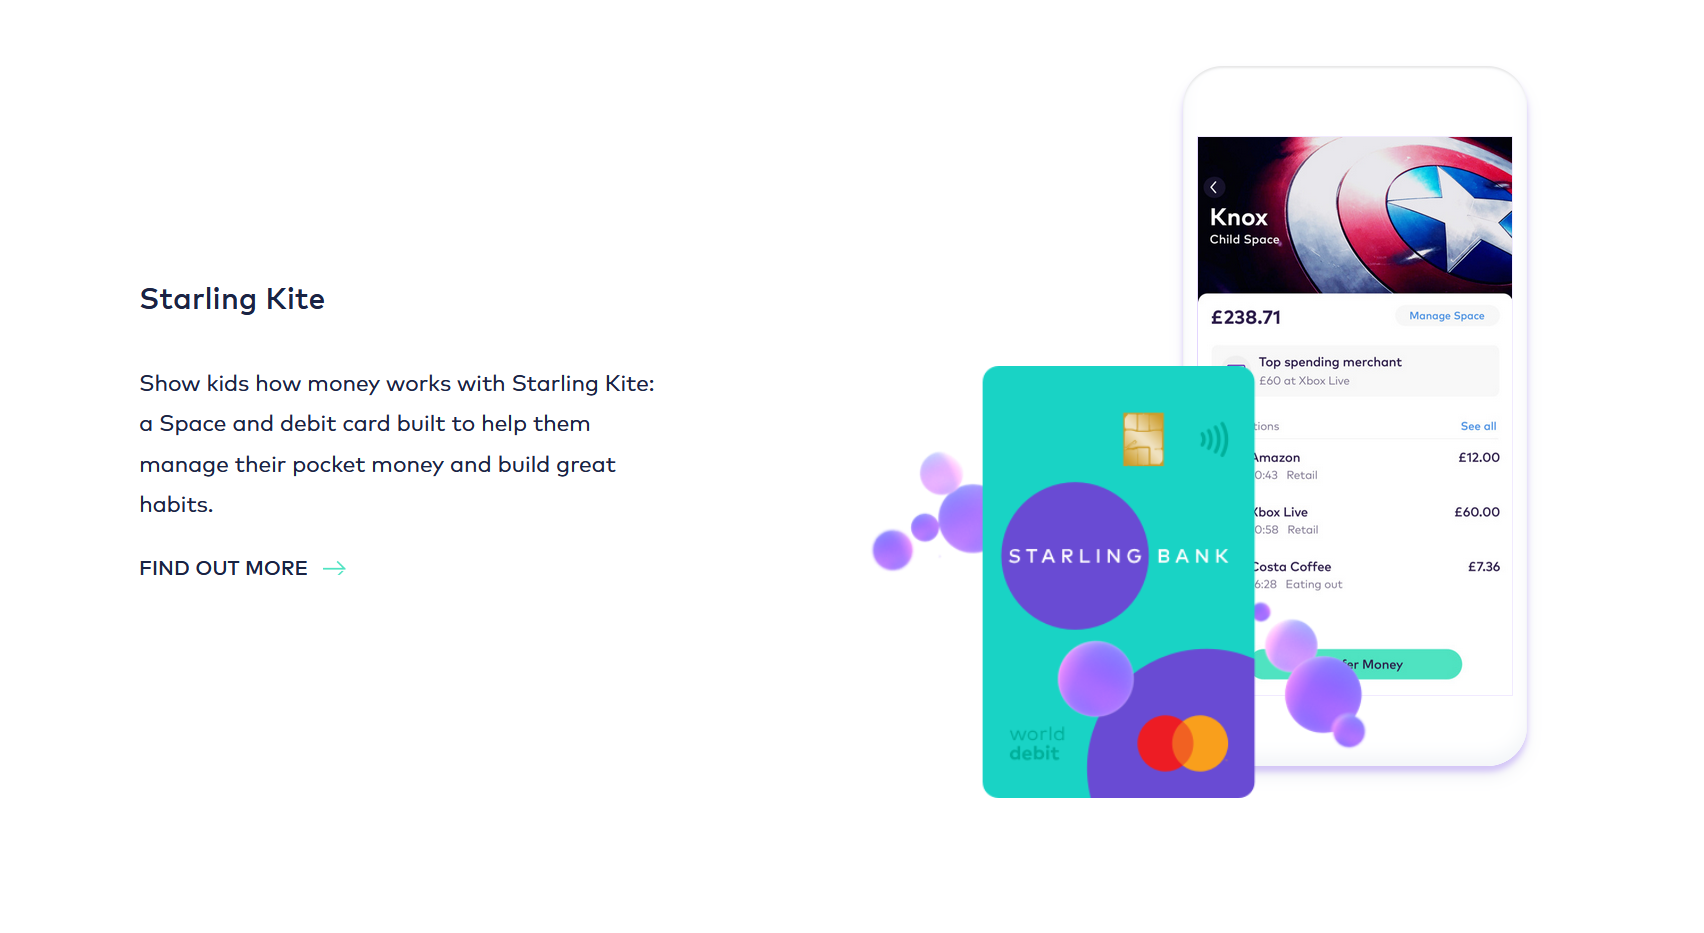 starling bank homepage